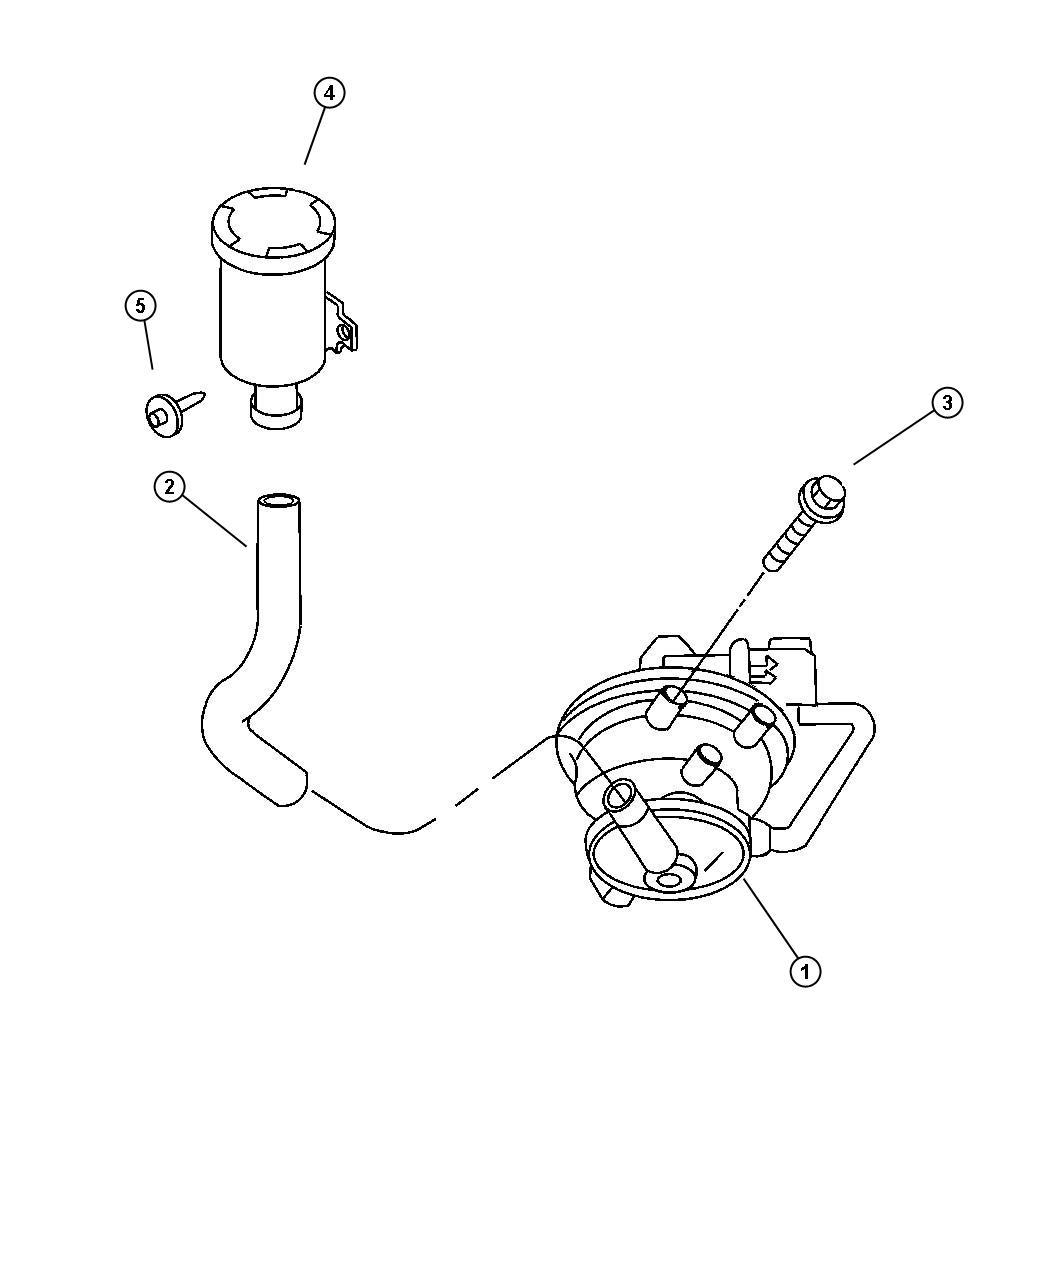 Dodge Durango Pump Leak Detection